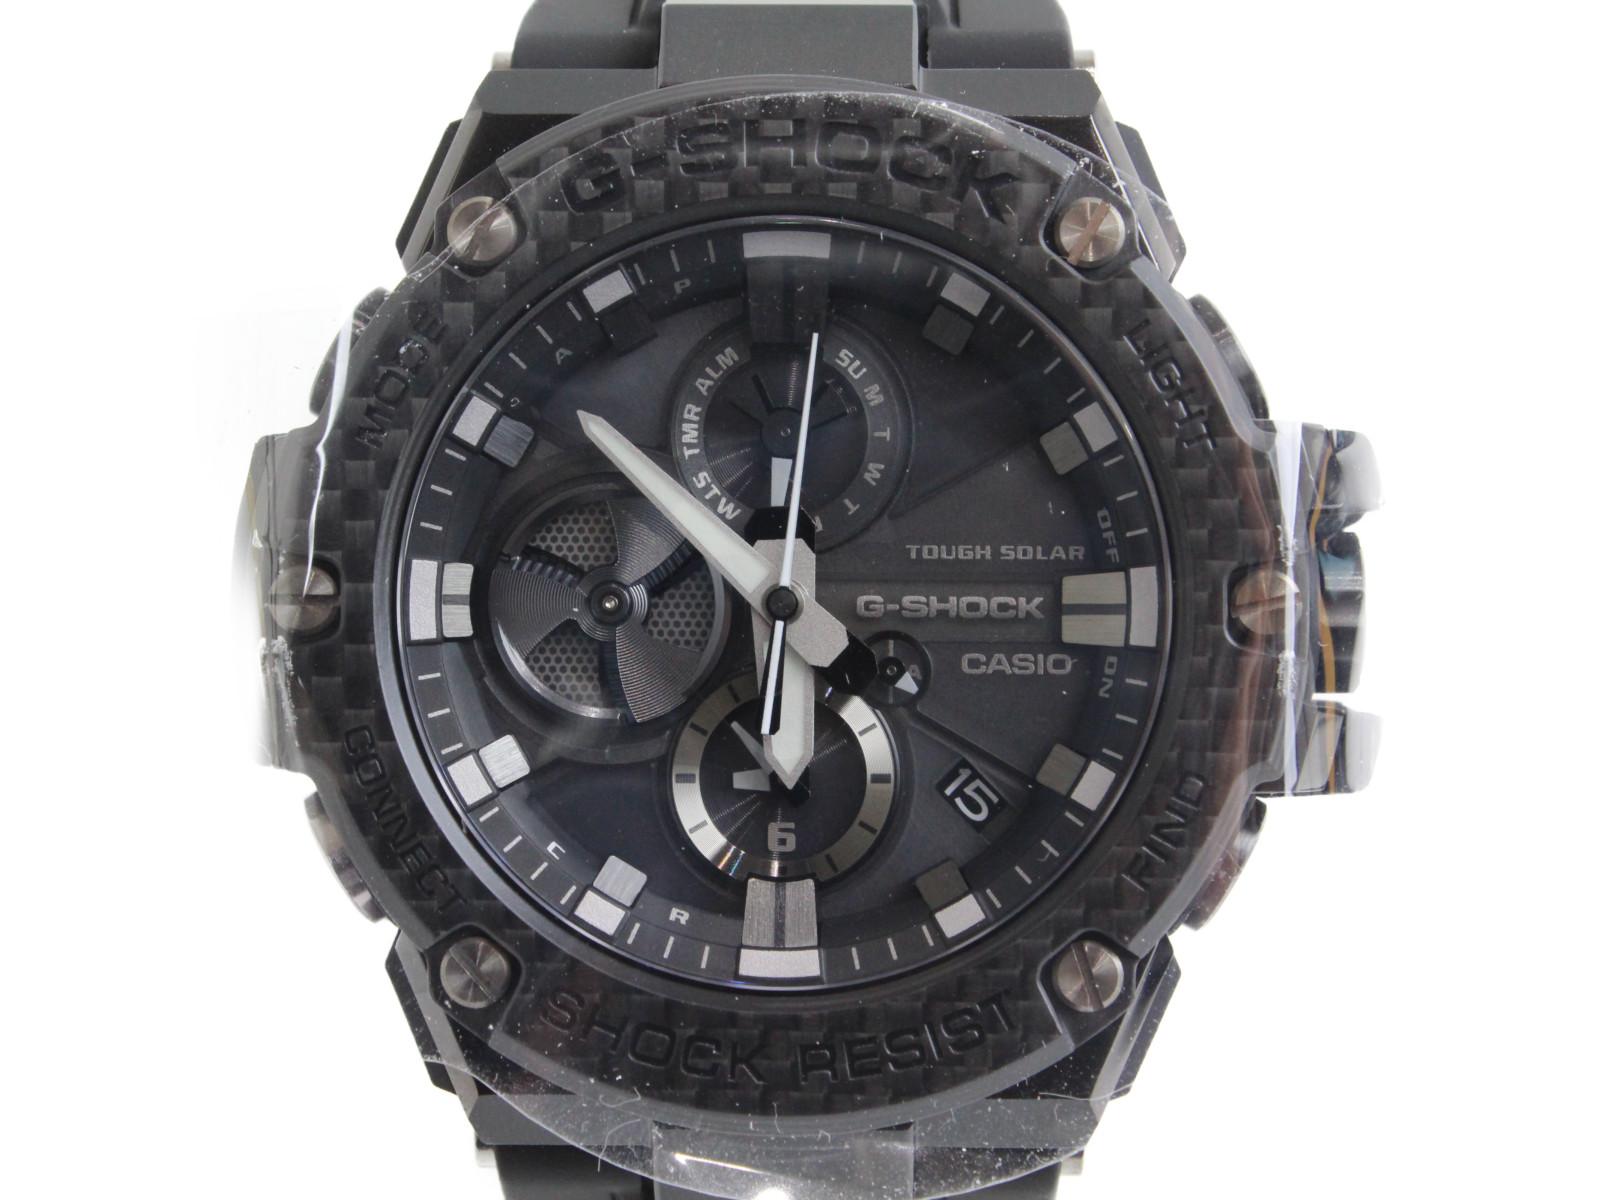 【Bluetooth】CASIO カシオ G-SHOCK ジーショック G-STEEL GST-B100X-1AJF タフソーラー アナログ SS ステンレススチール ラバー ブラック メンズ 腕時計【中古】